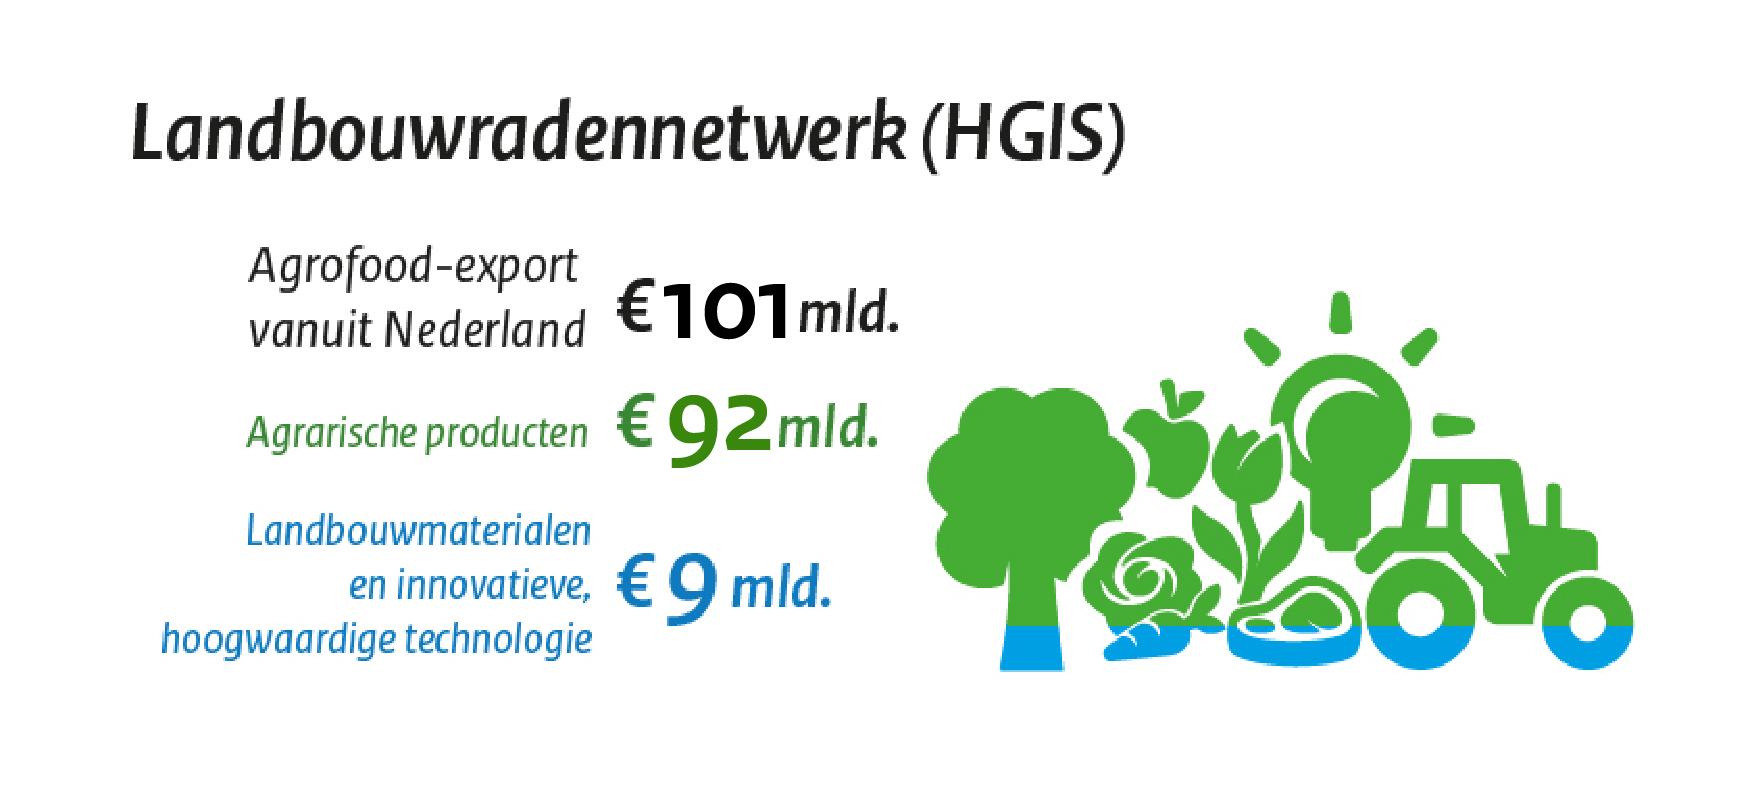 Landbouwradennetwerk (HGIS) Agrofood-export  vanuit Nederland €101 mld.